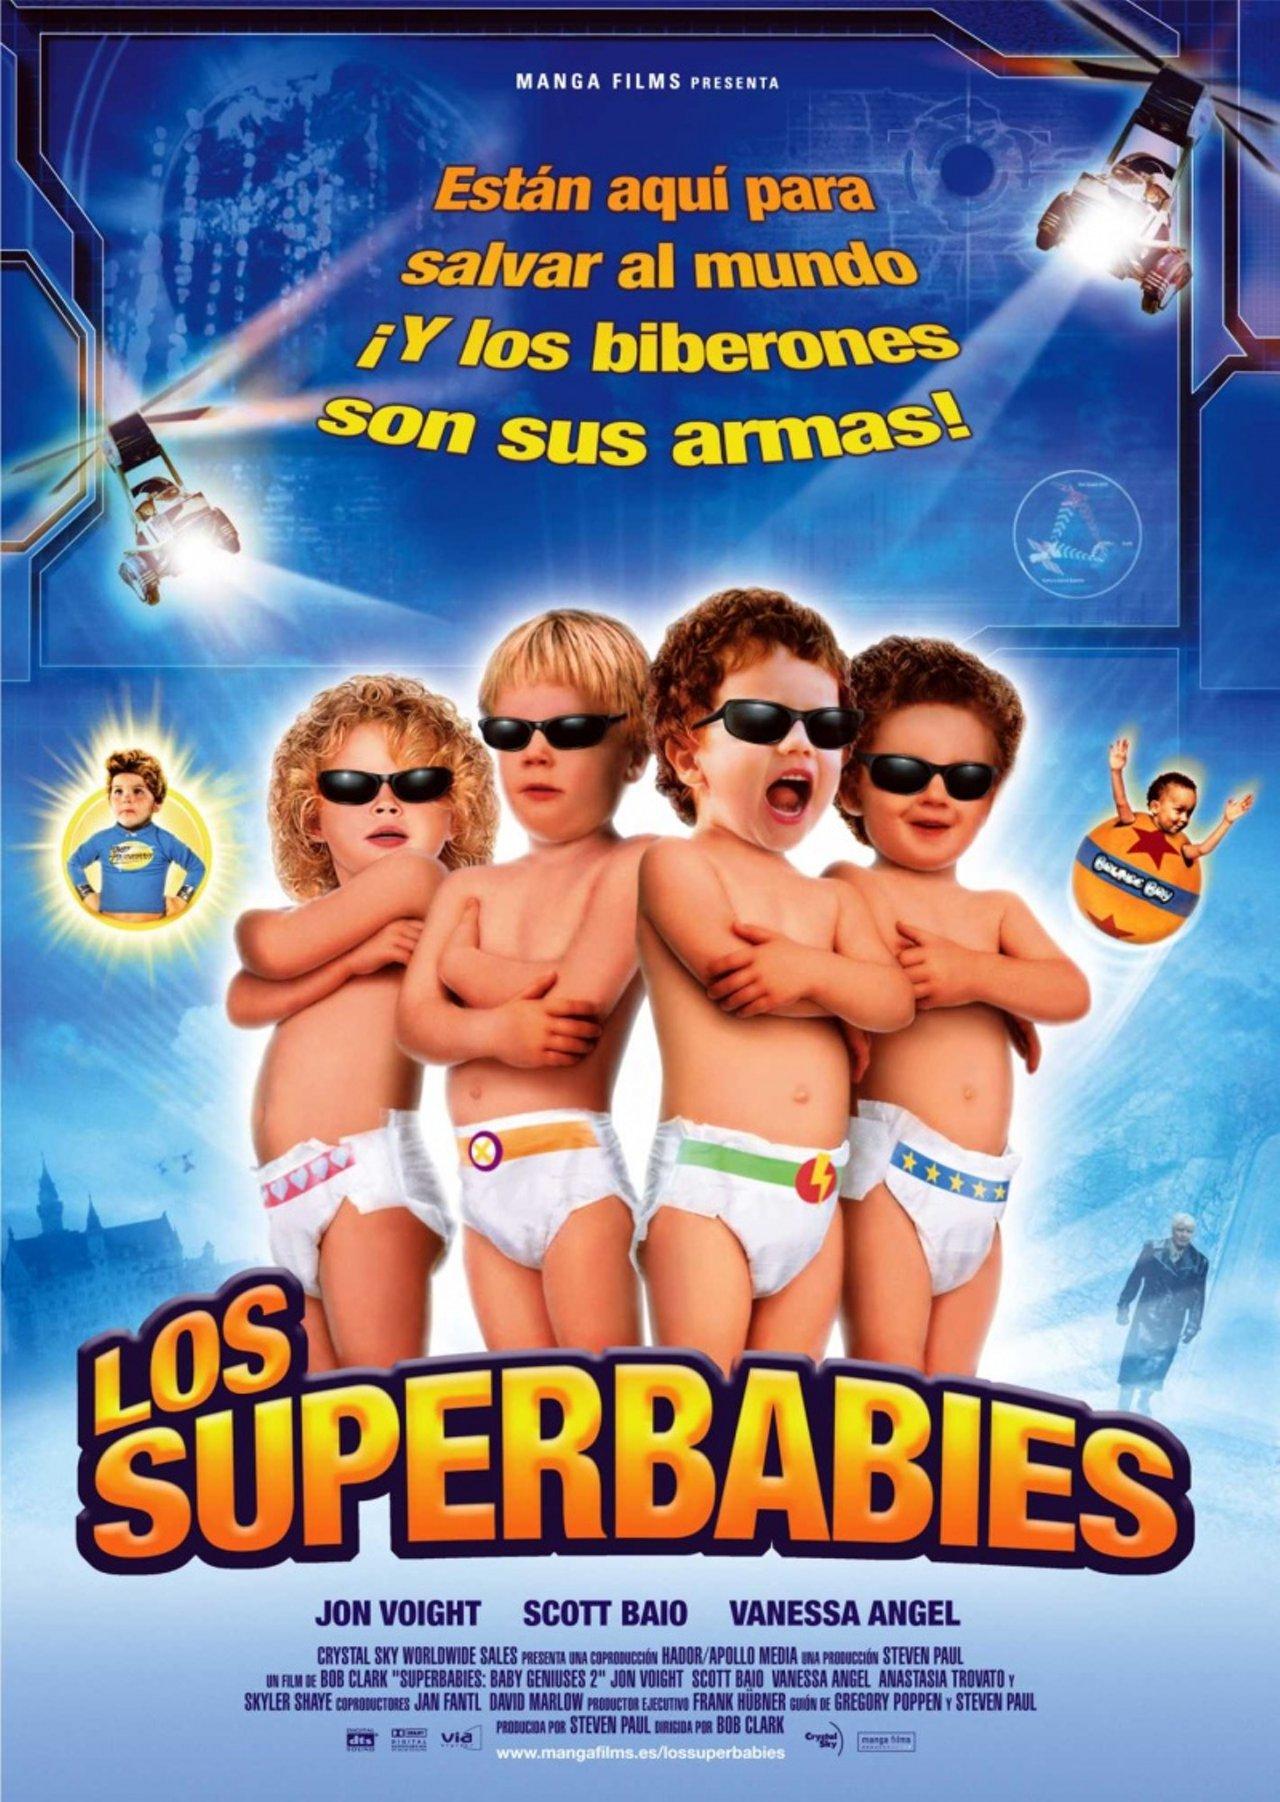 2019 год - Супердетки: Вундеркинды 2 (Superbabies: Baby Geniuses 2, 2004) - МИР Кино - foboxs.com